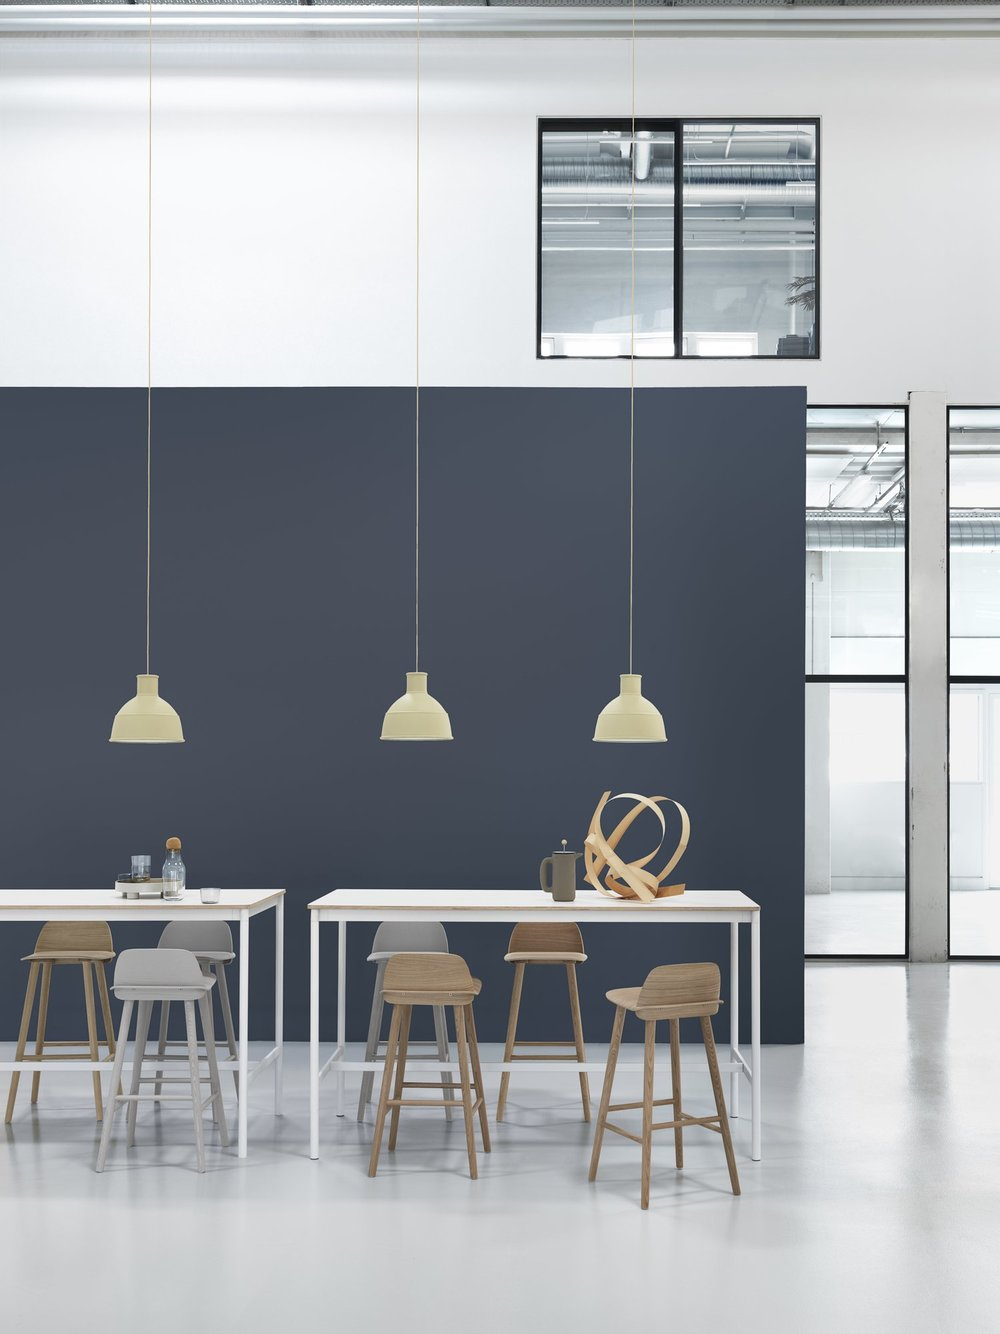 Base-High-Table-White-Plywood-Unfold-Beige-Green-Nerd-Bar-Stool-grey-Oak-Corky-Platform-Tray-Push-Org.jpg